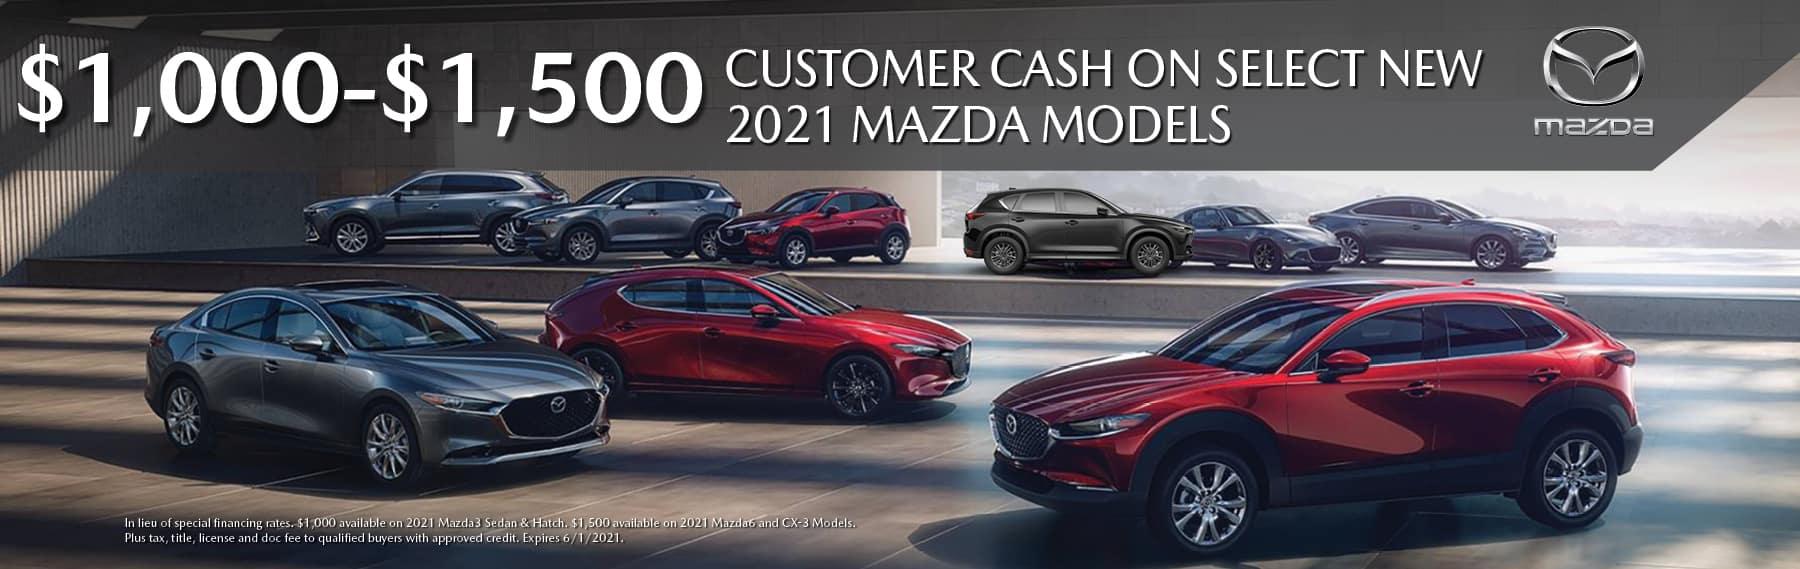 Customer Cash on select New Mazda models